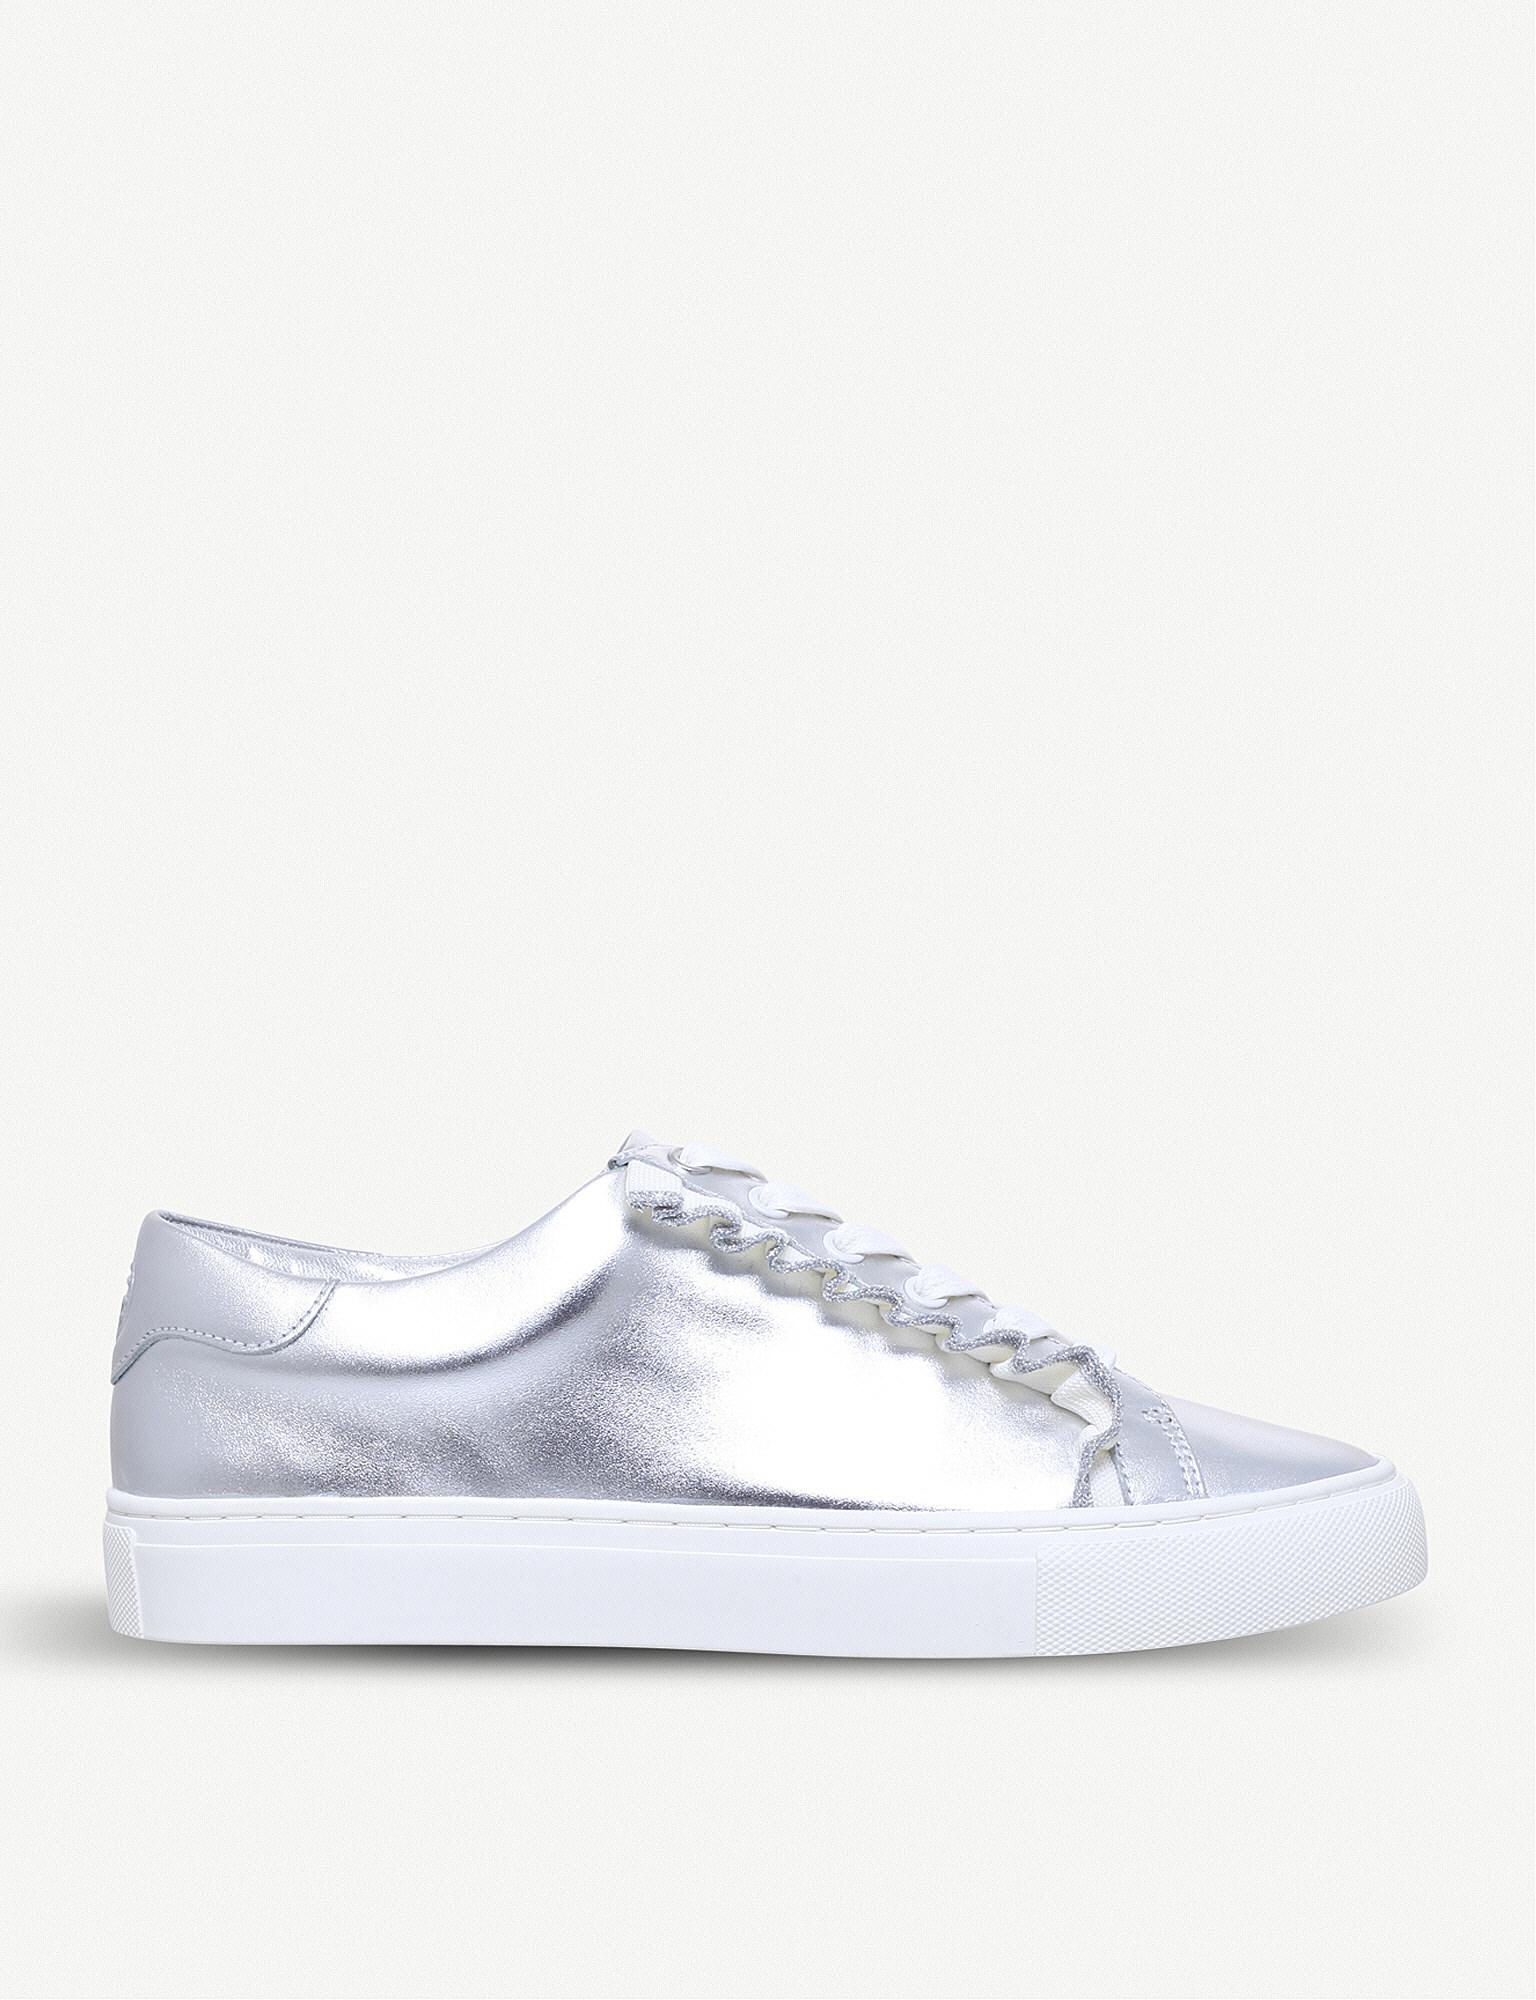 Ruffled Metallic Leather Sneakers - Silver Tory Burch jMsh988